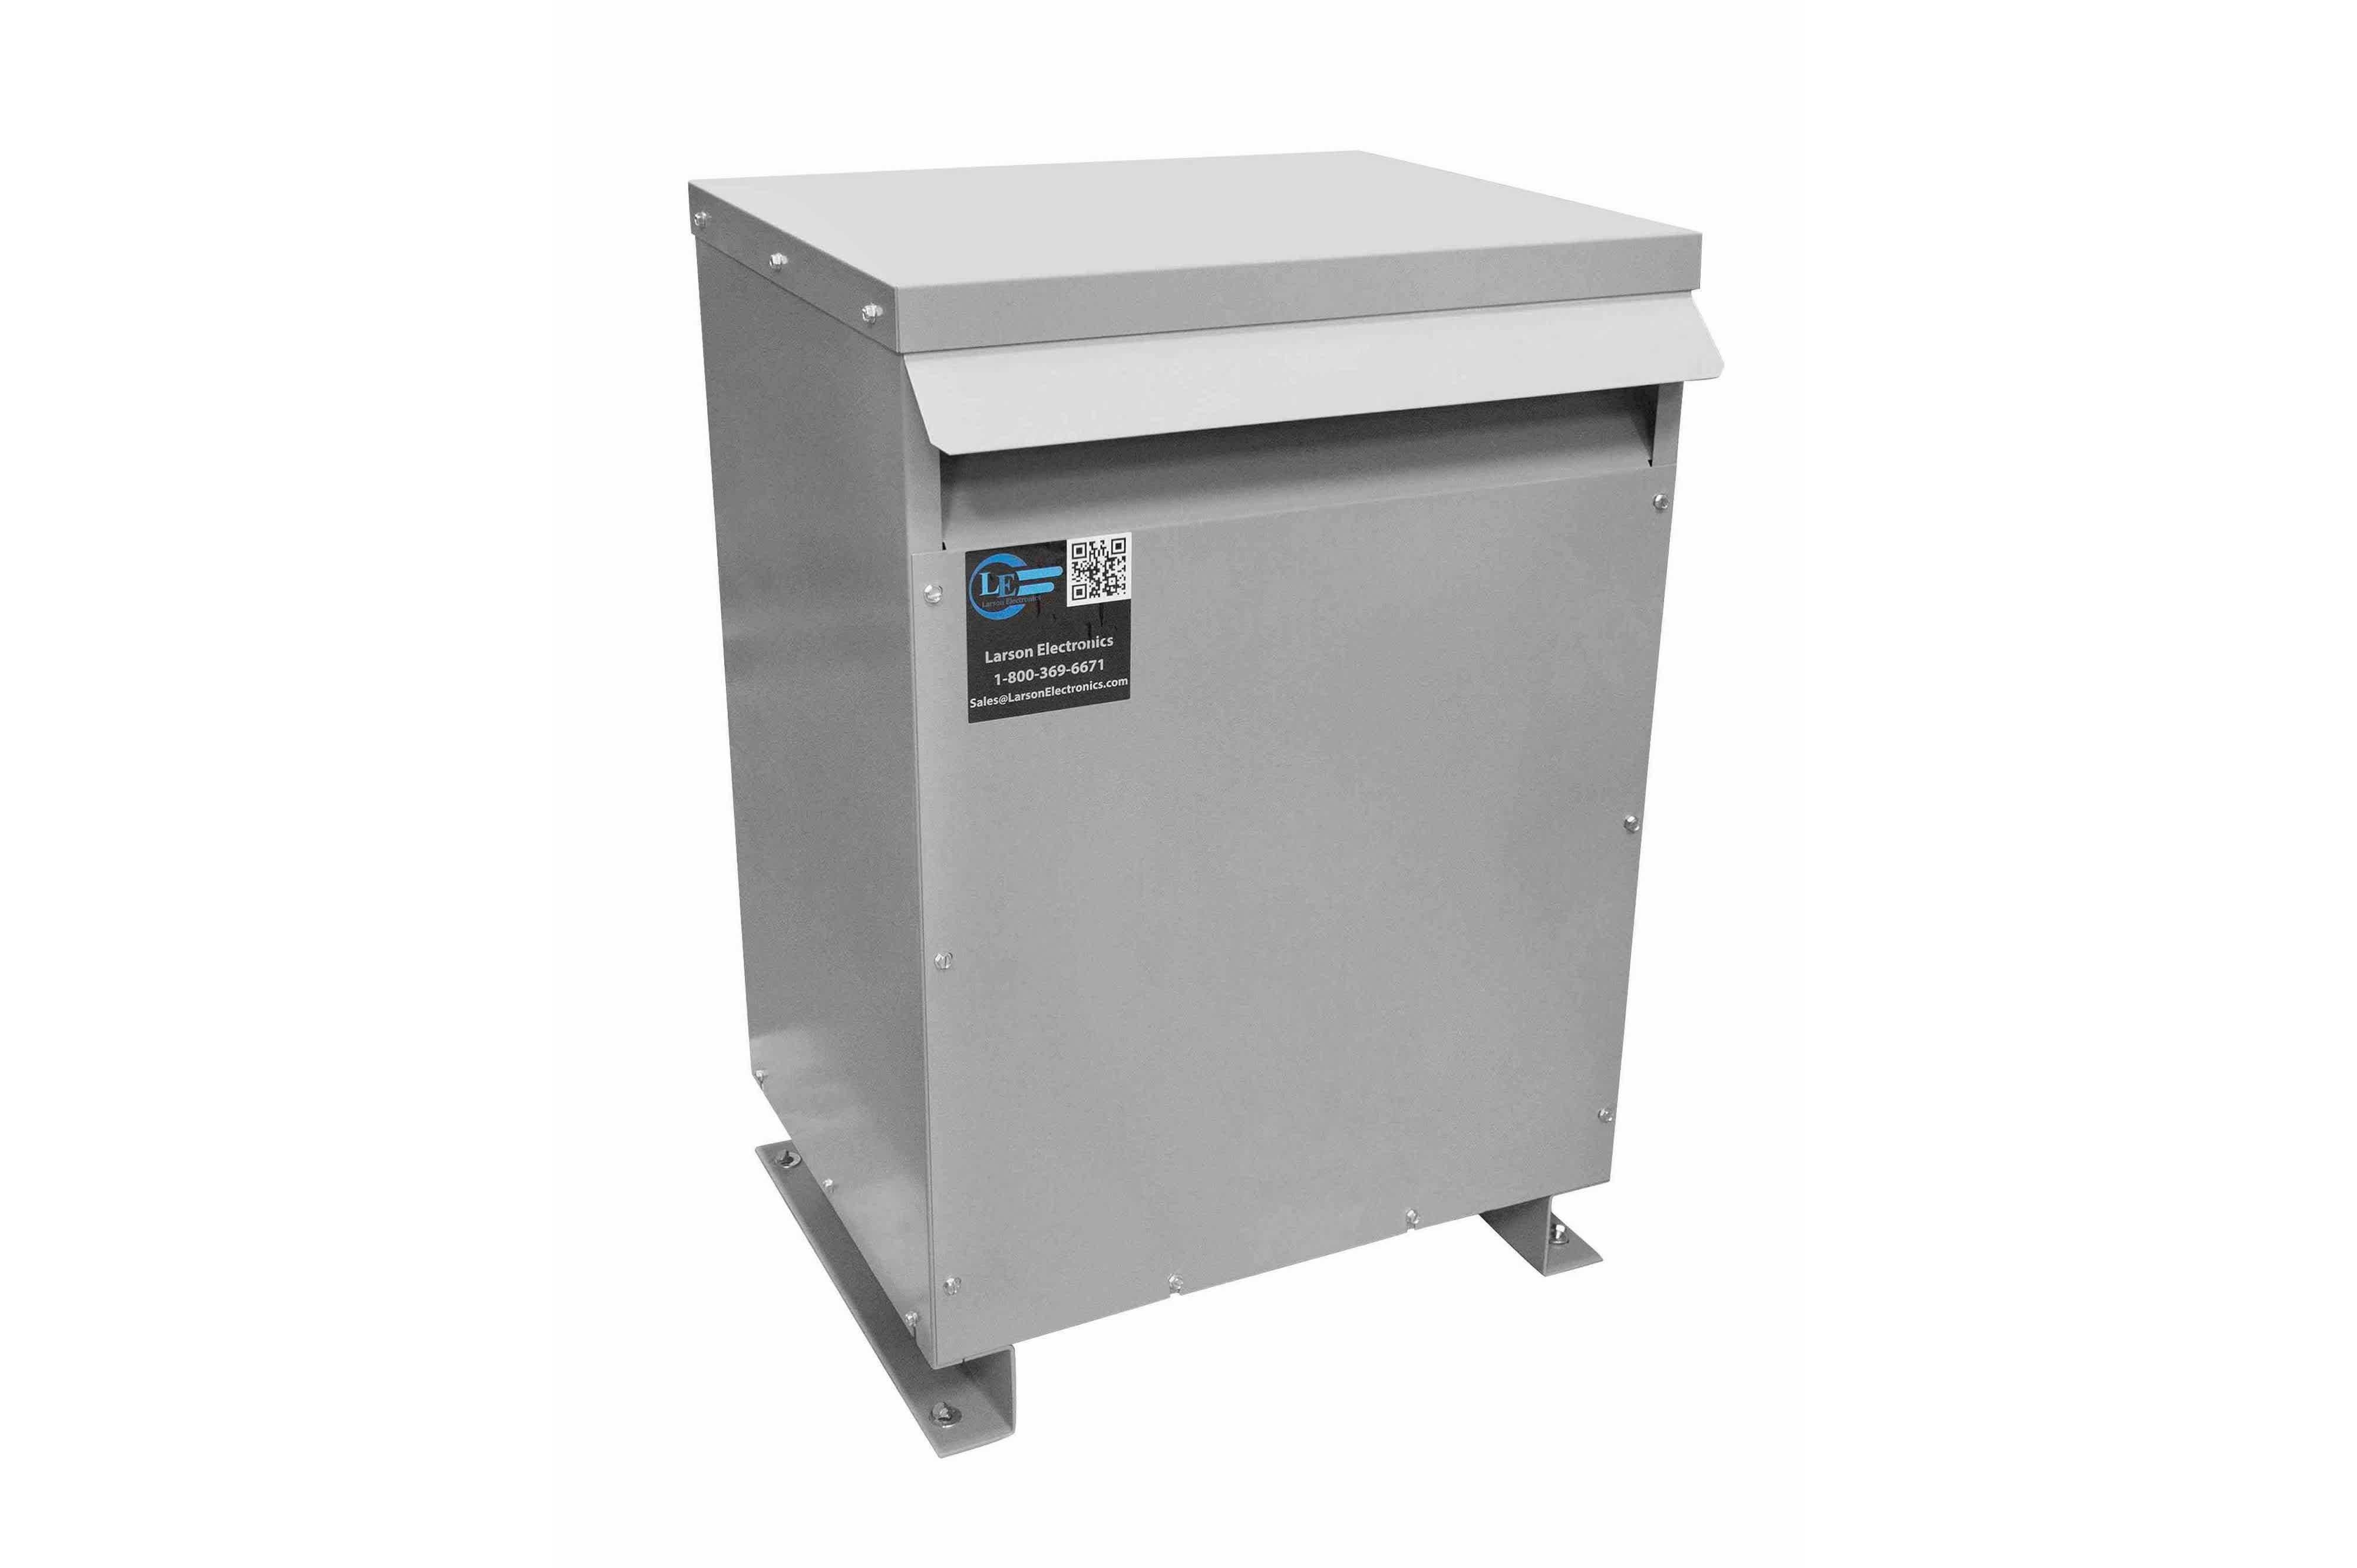 14 kVA 3PH Isolation Transformer, 230V Wye Primary, 208V Delta Secondary, N3R, Ventilated, 60 Hz